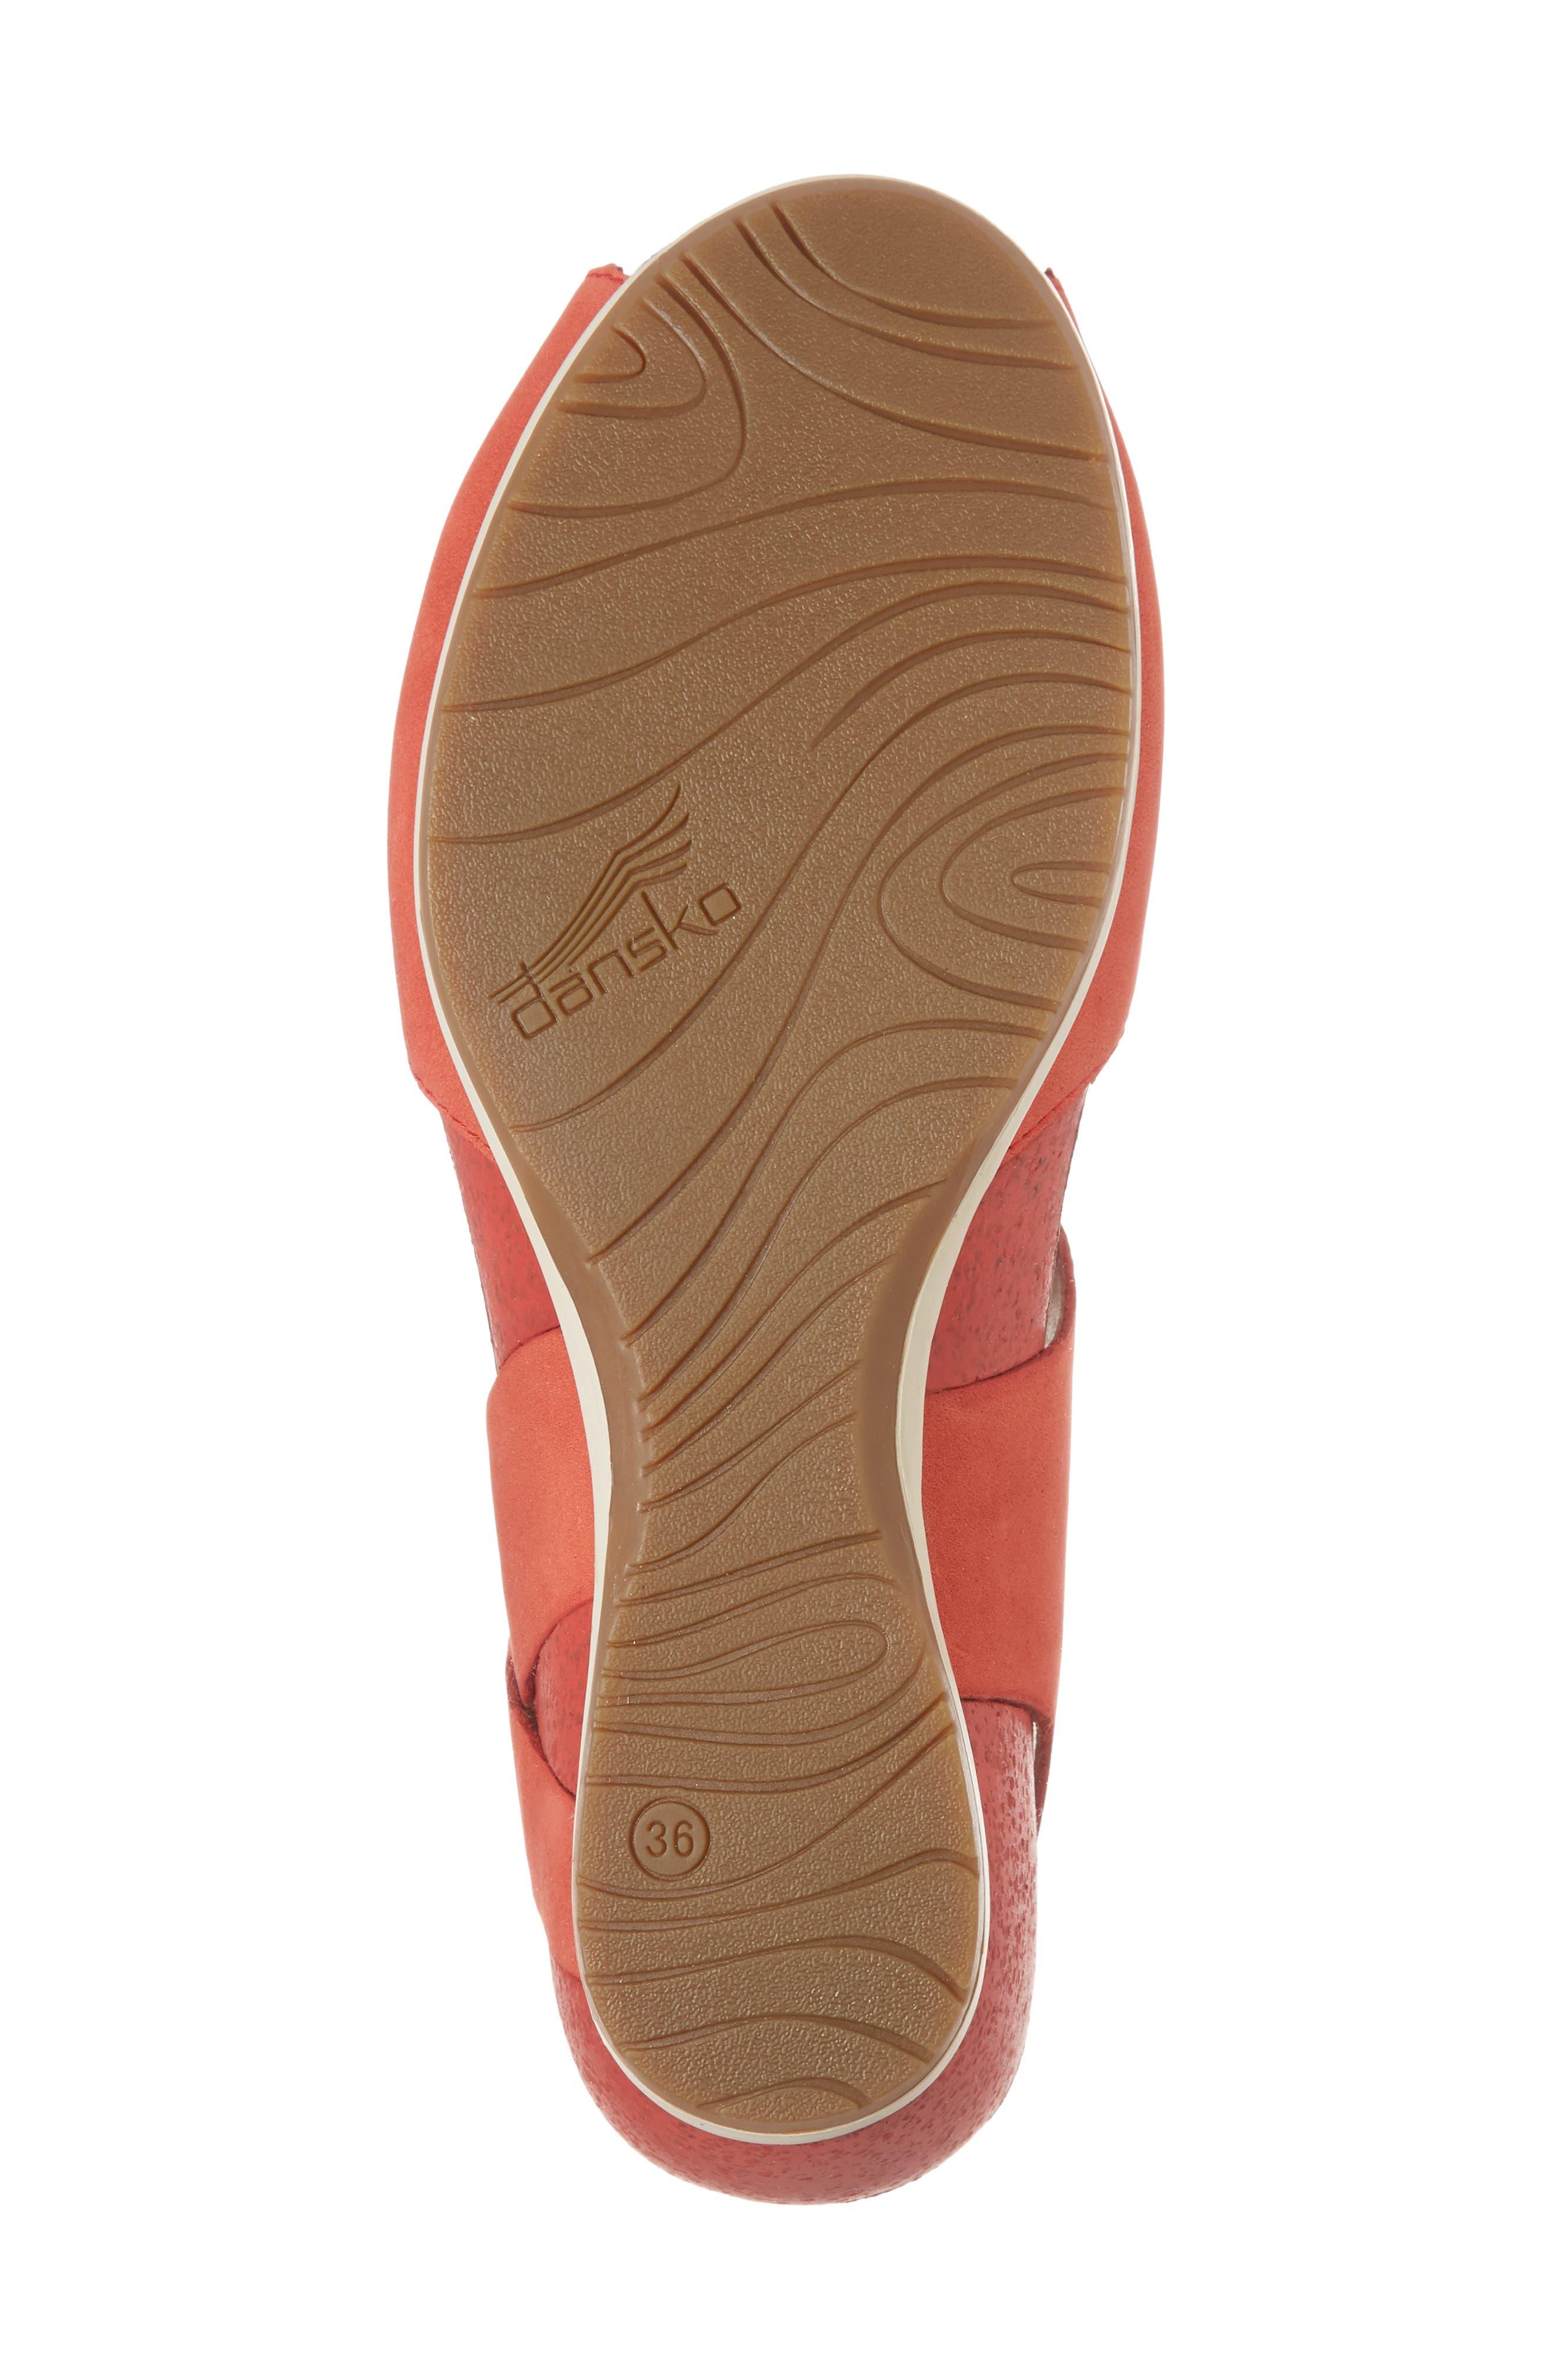 Vera Sandal,                             Alternate thumbnail 6, color,                             Tomato Milled Nubuck Leather